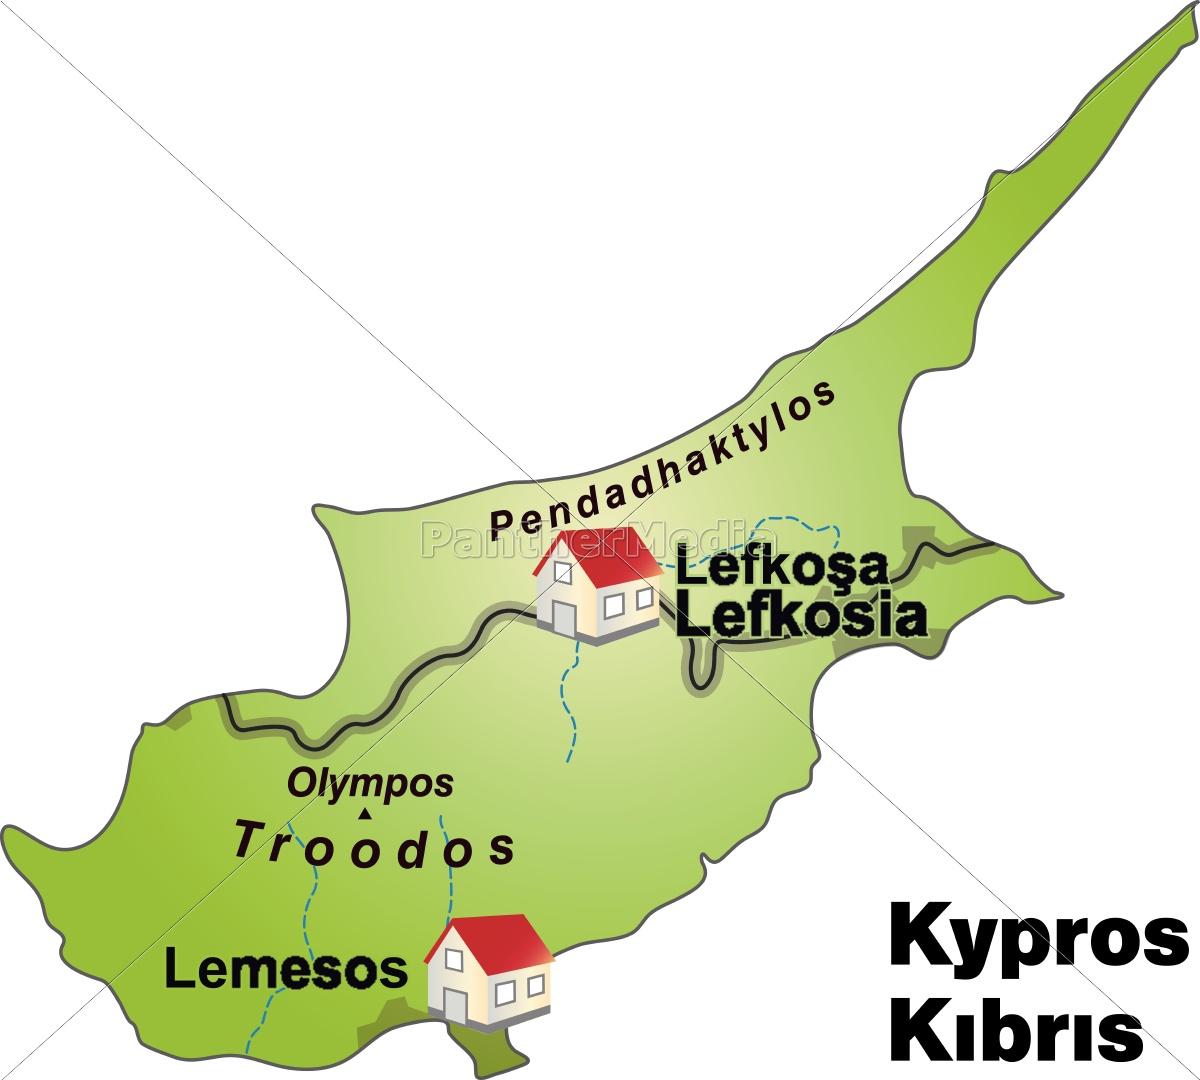 Kort Over Cypern Som En Infografik I Gron Royalty Free Image